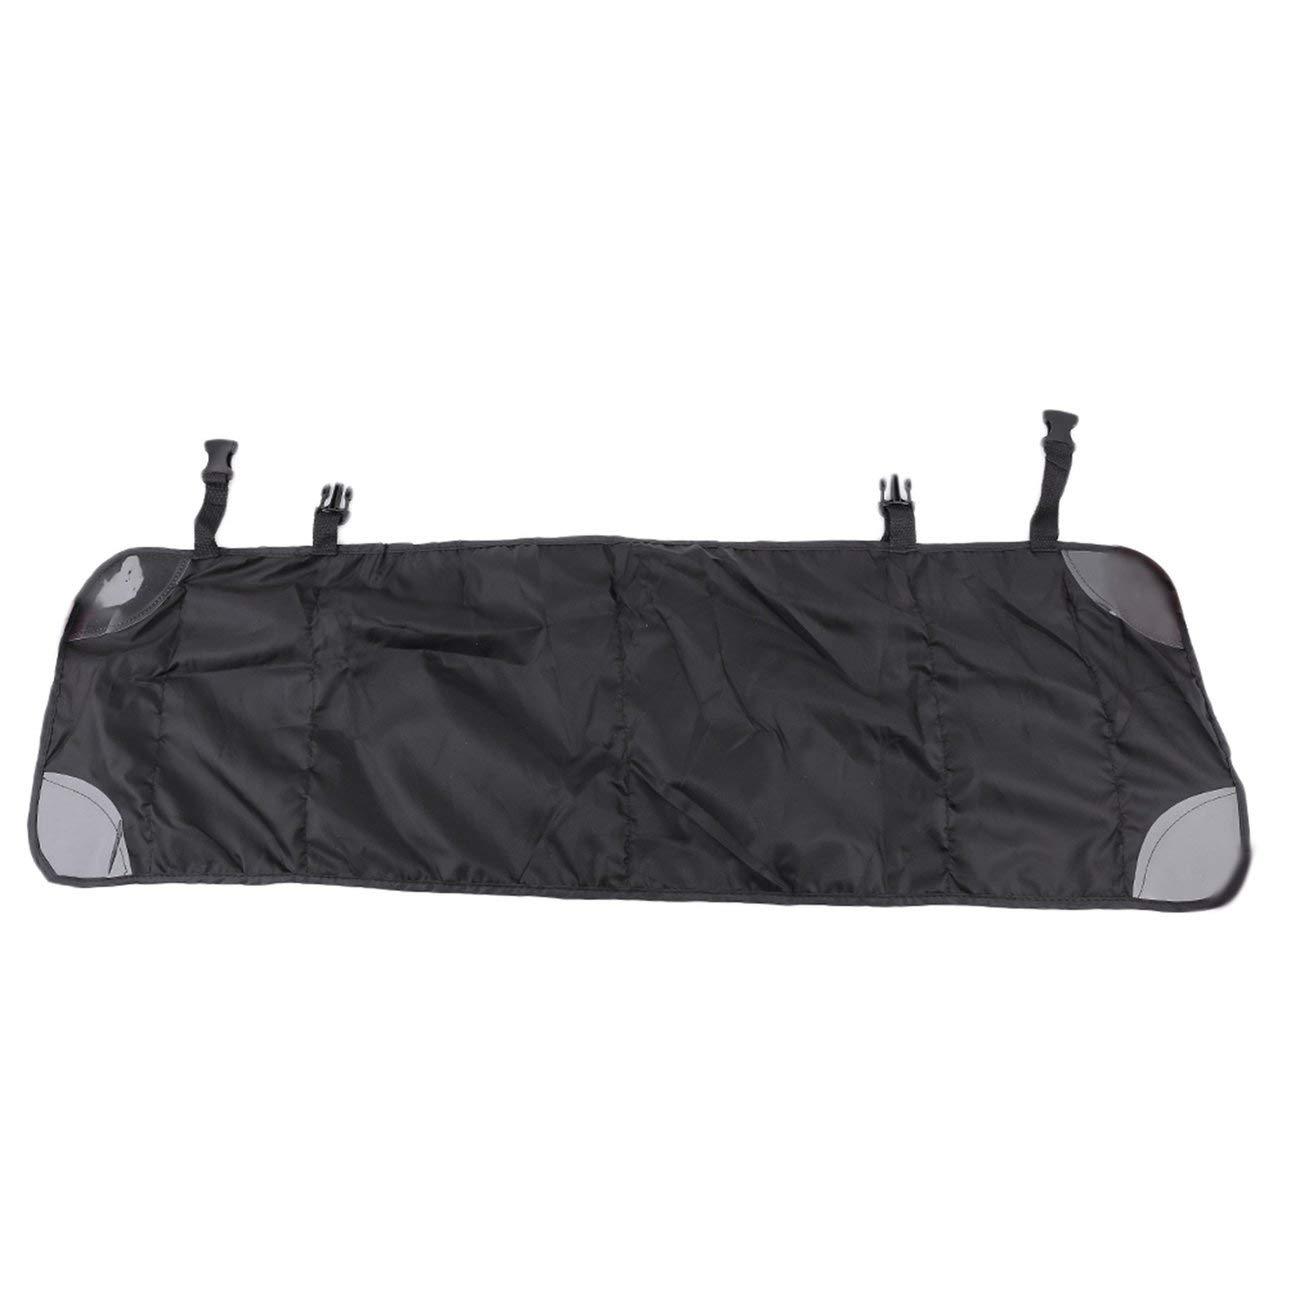 Longue Style Auto Car Seat Sac à Dos Sac Voyage Hanging Stockage Organisateur Tissu Oxford Trash Porte-Net (Noir)